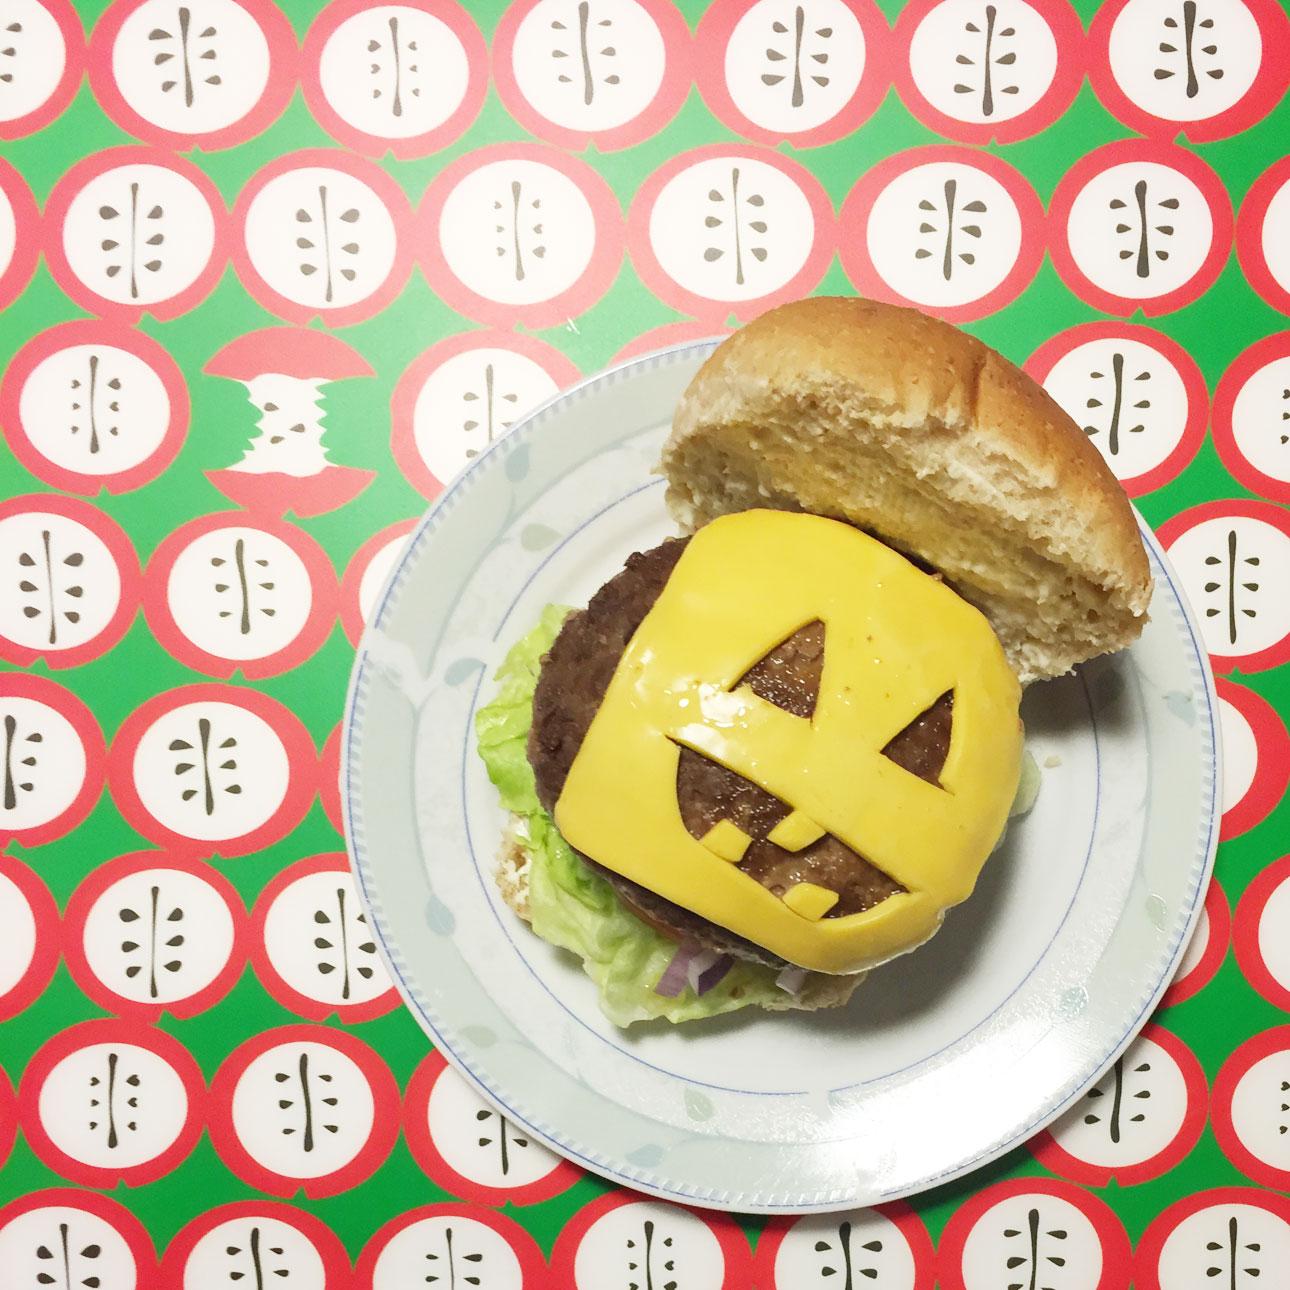 Mamalifestyle oktober 2015 Halloween burger